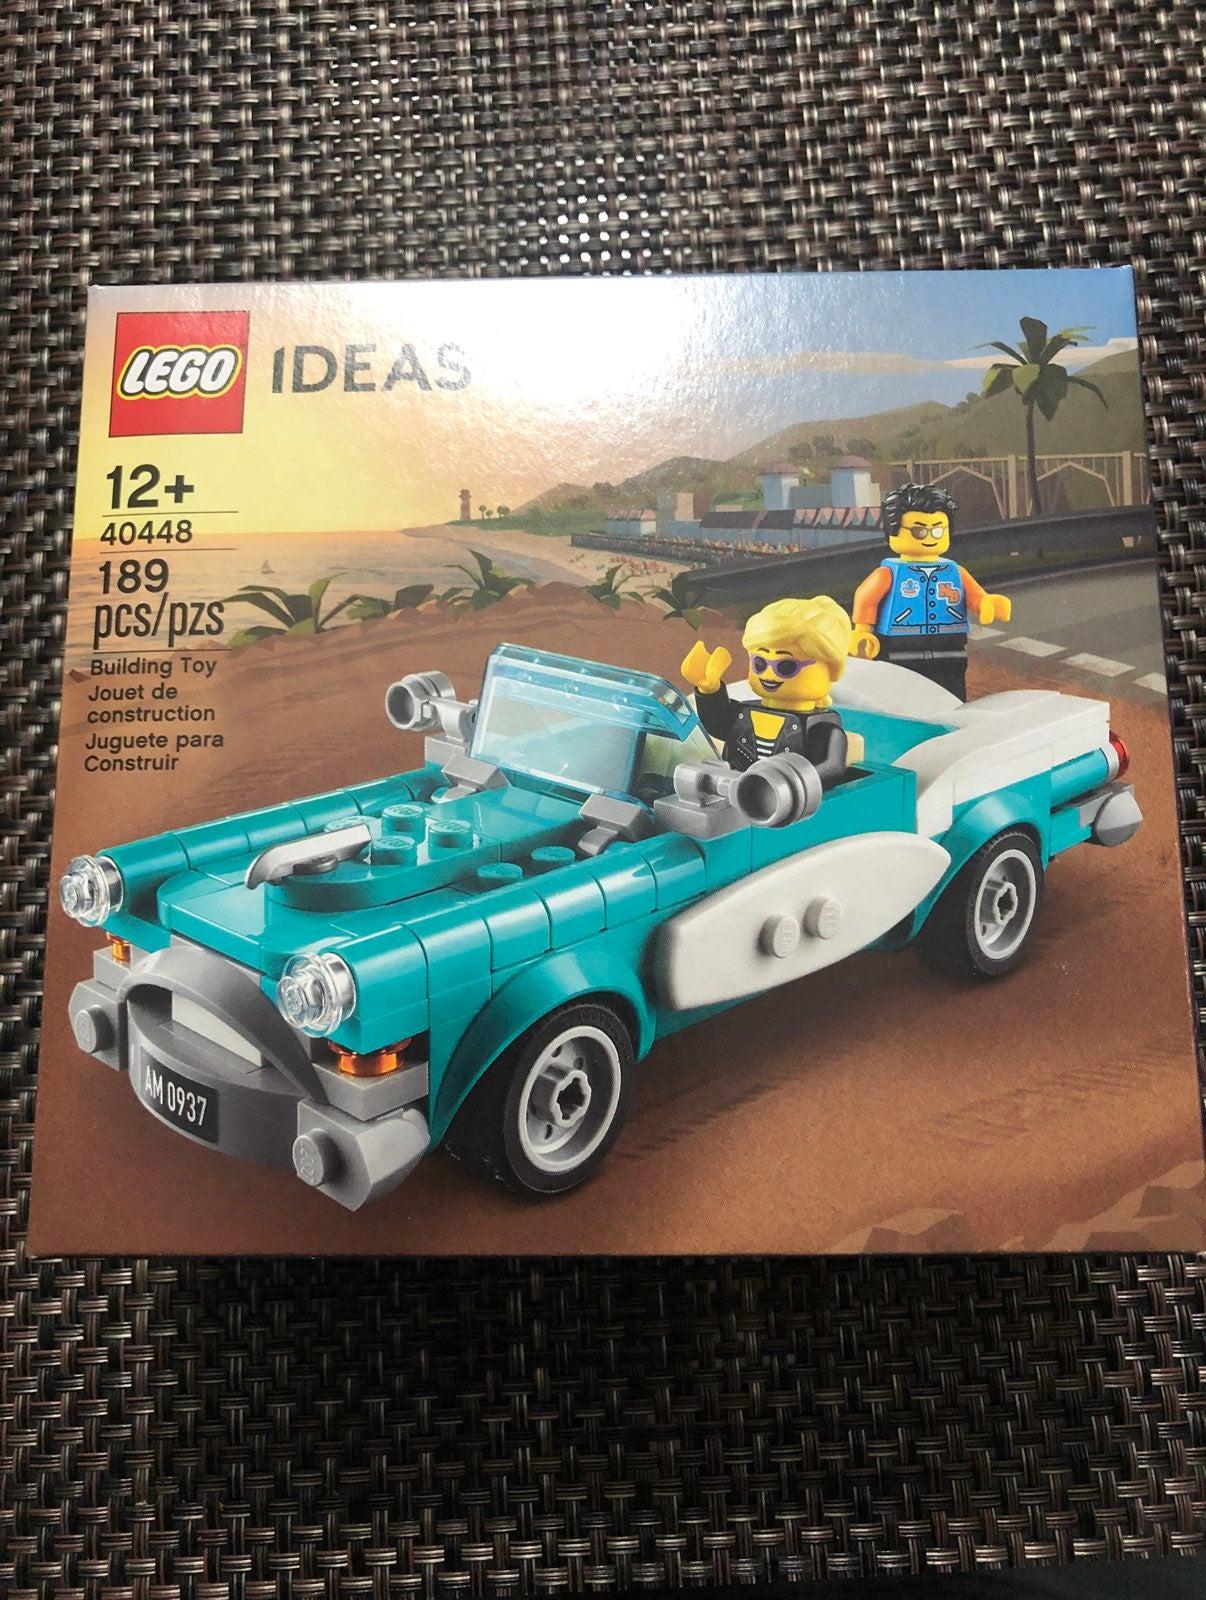 LEGO ideas vintage car 40448